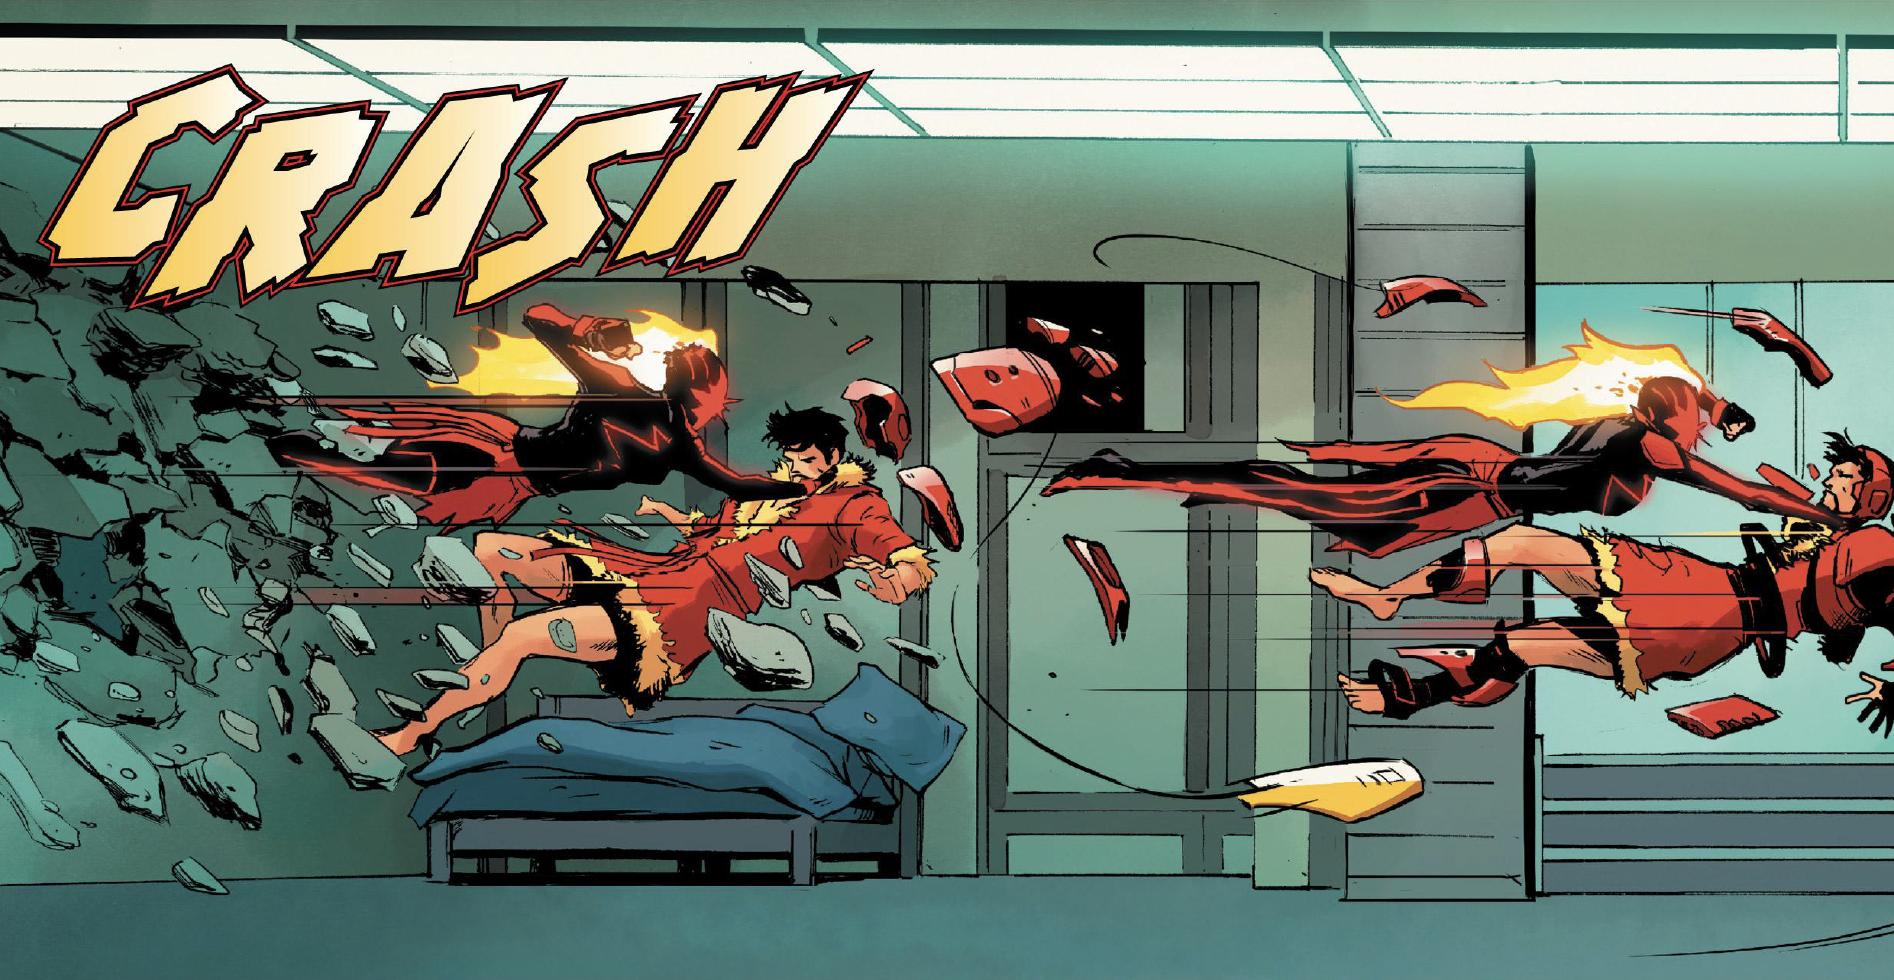 Carol Danvers (Captain Marvel) punches Tony Stark through a wall in Captain Marvel #13